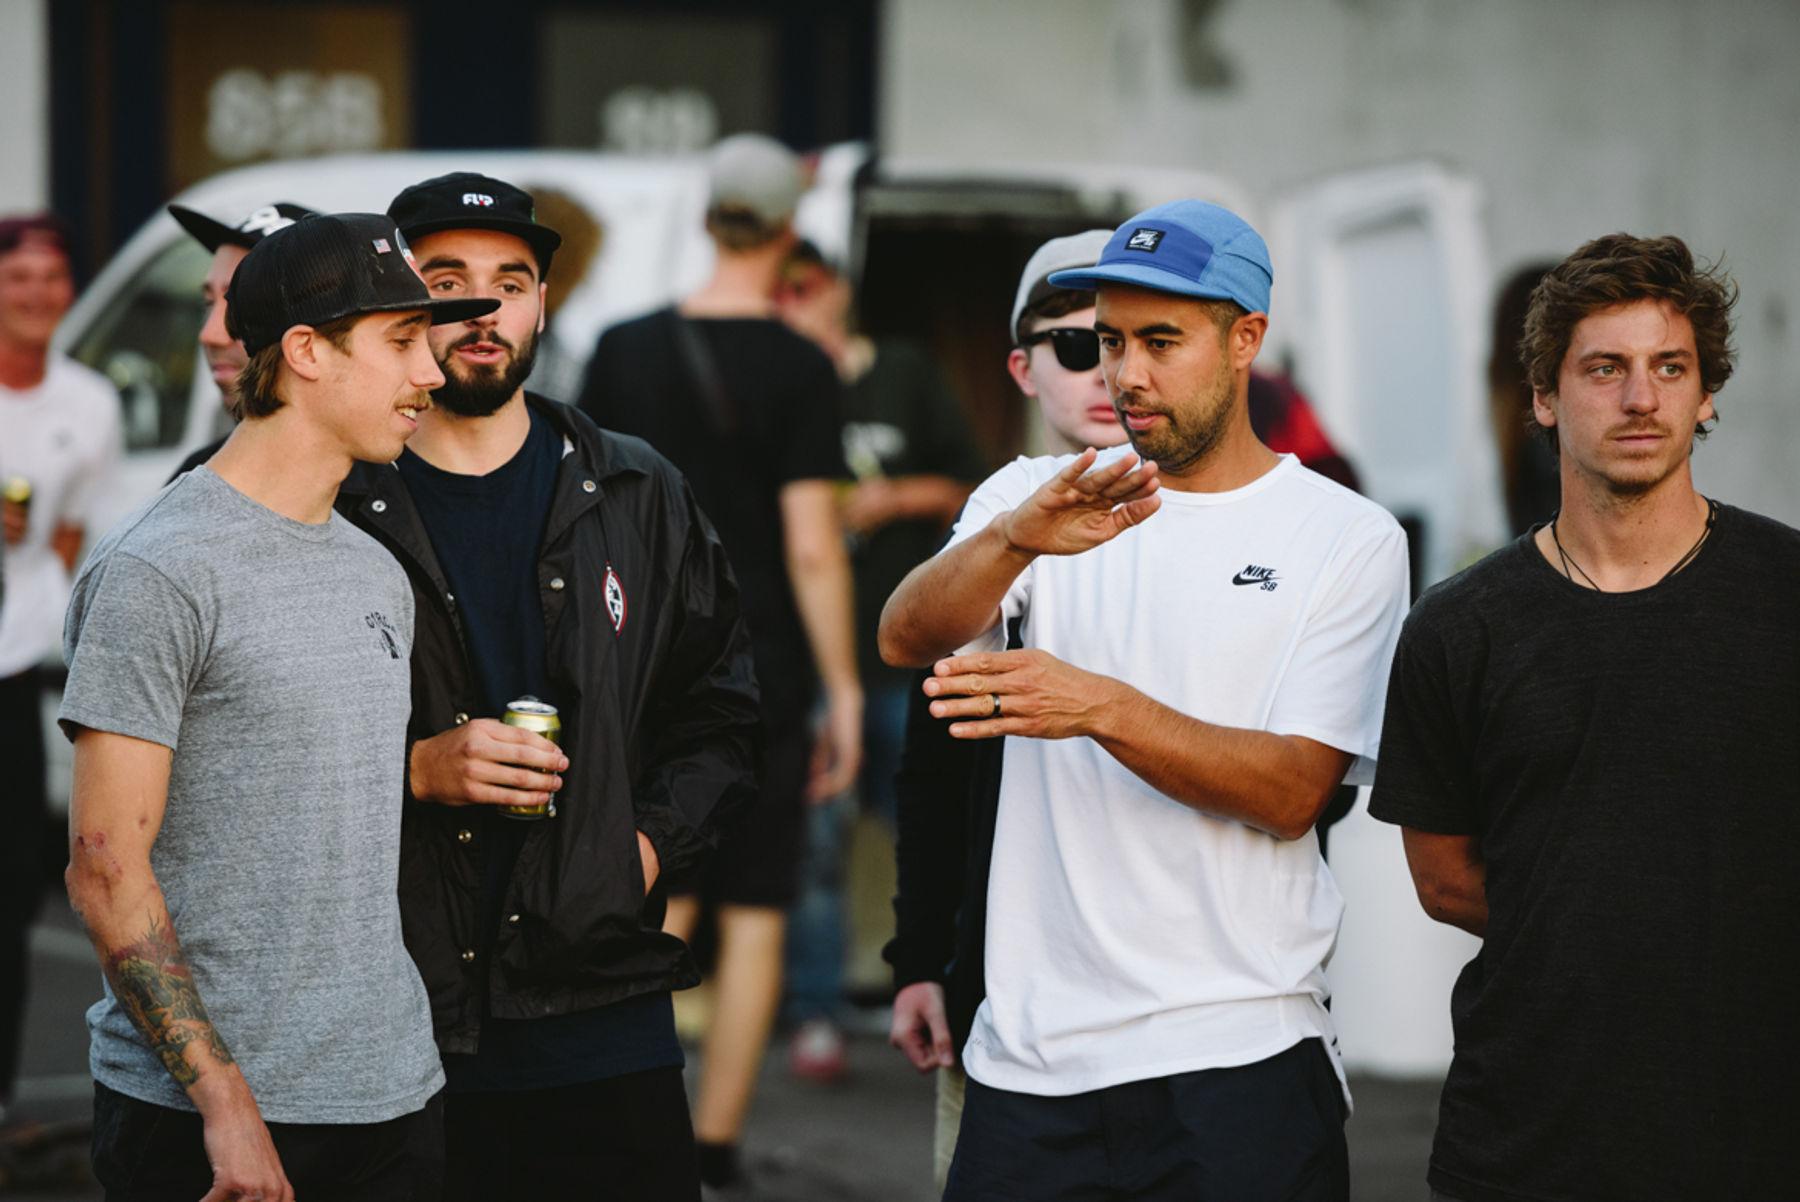 _IHC4327e-David-Gravette-Matt-Berger-Eric-Koston-Cory-Kennedy-Nike-SB-Copenhagen-Open-Ledges-Meat-Packing-District-Day-2-July-2015-Photographer-Maksim-Kalanep